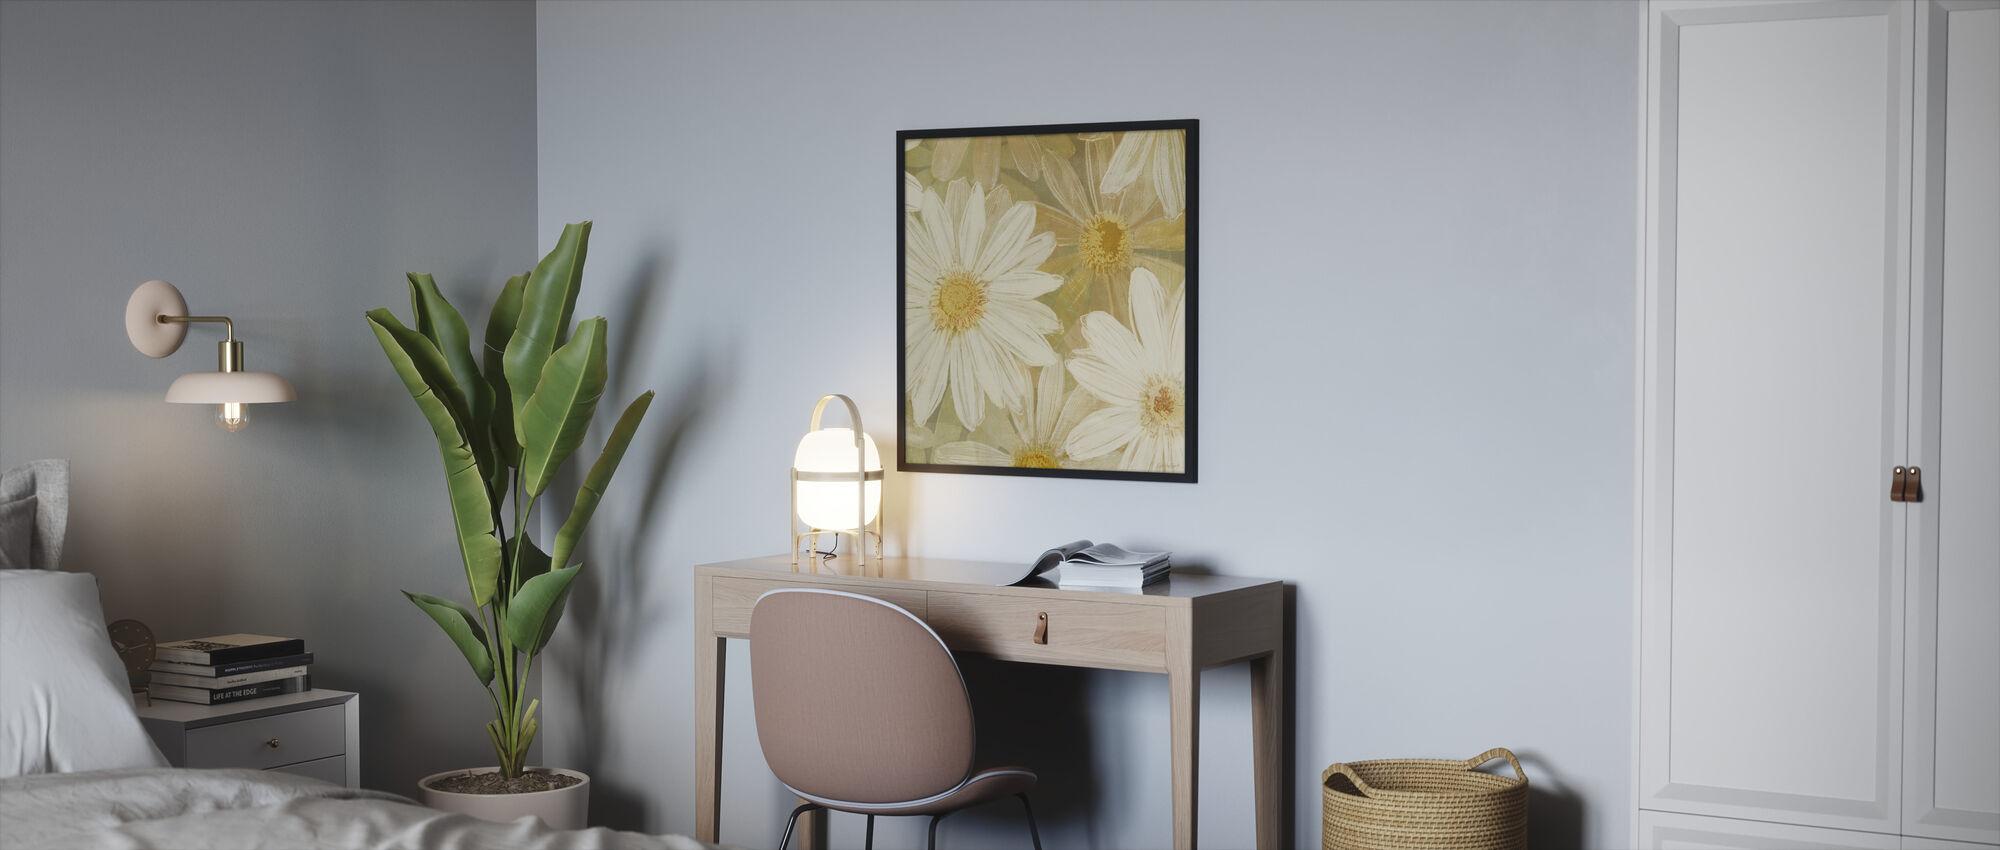 Daisy Story Square II - Framed print - Bedroom